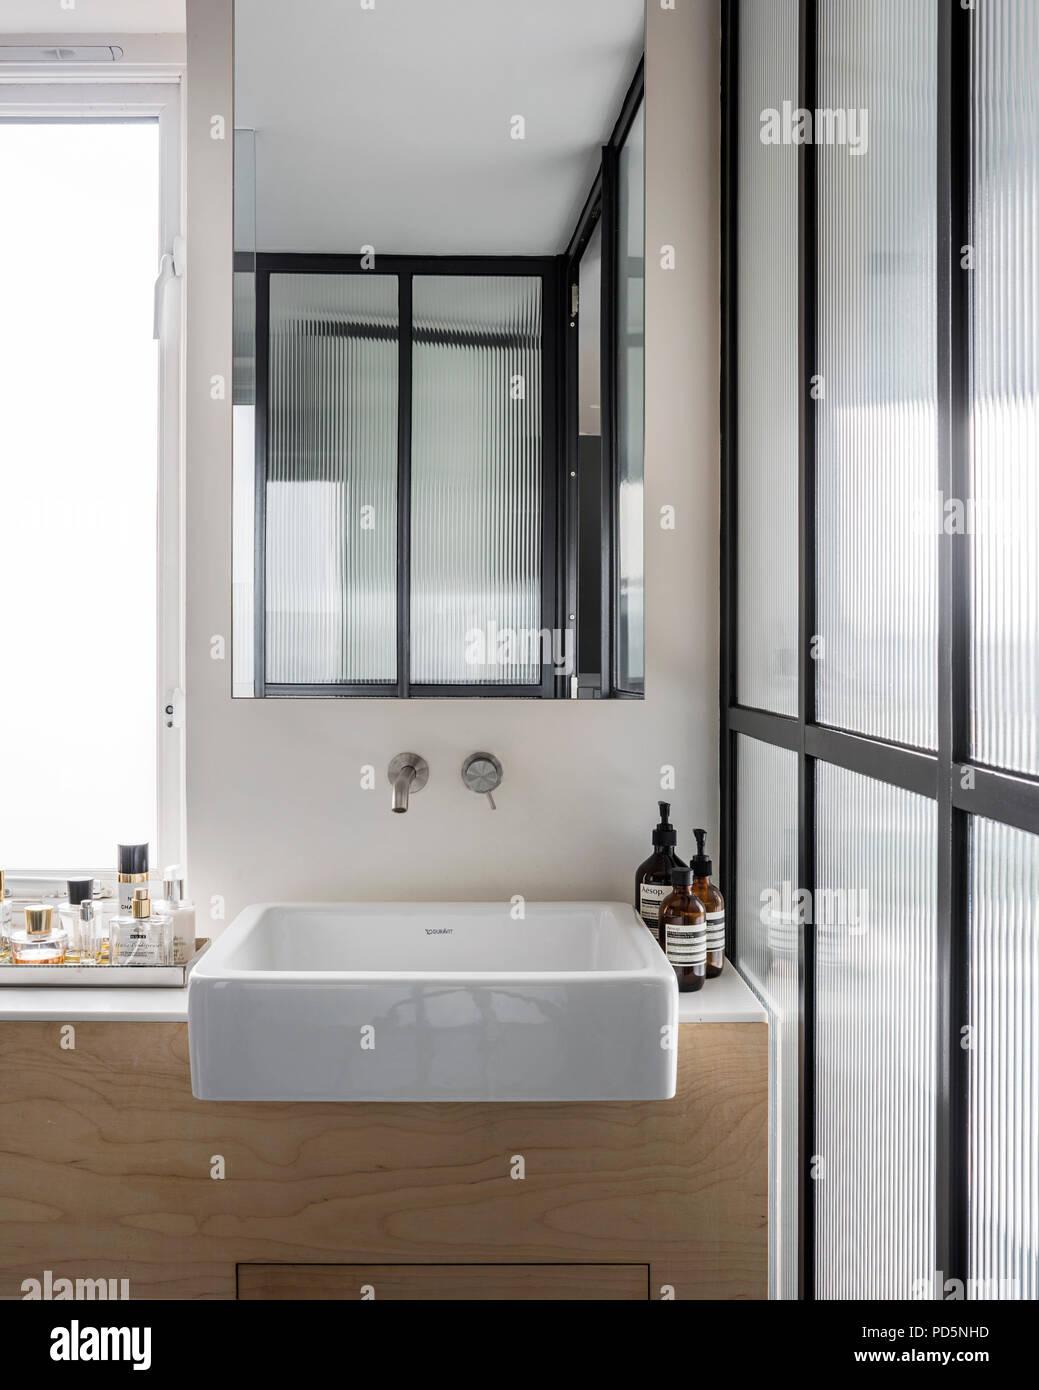 Elegant vanity area with corrugated glass panels and ceramic basin - Stock Image